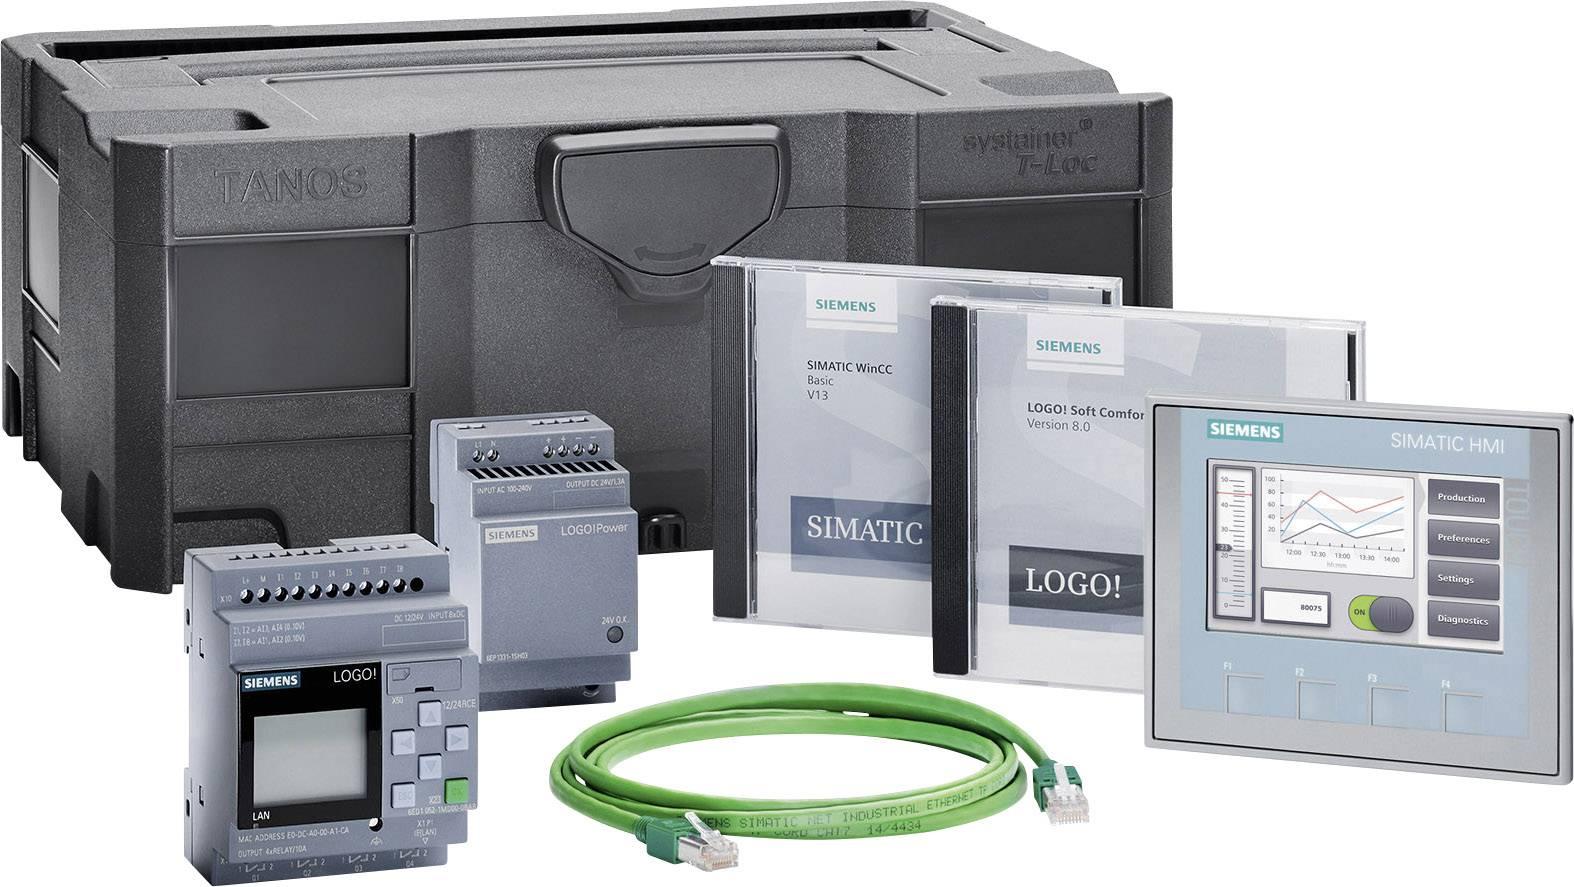 Startovací sada pro PLC Siemens LOGO! KTP400 BASIC STARTER LOGO! 12/24RCE 6AV2132-0KA00-0AA1, 12 V/DC, 24 V/DC